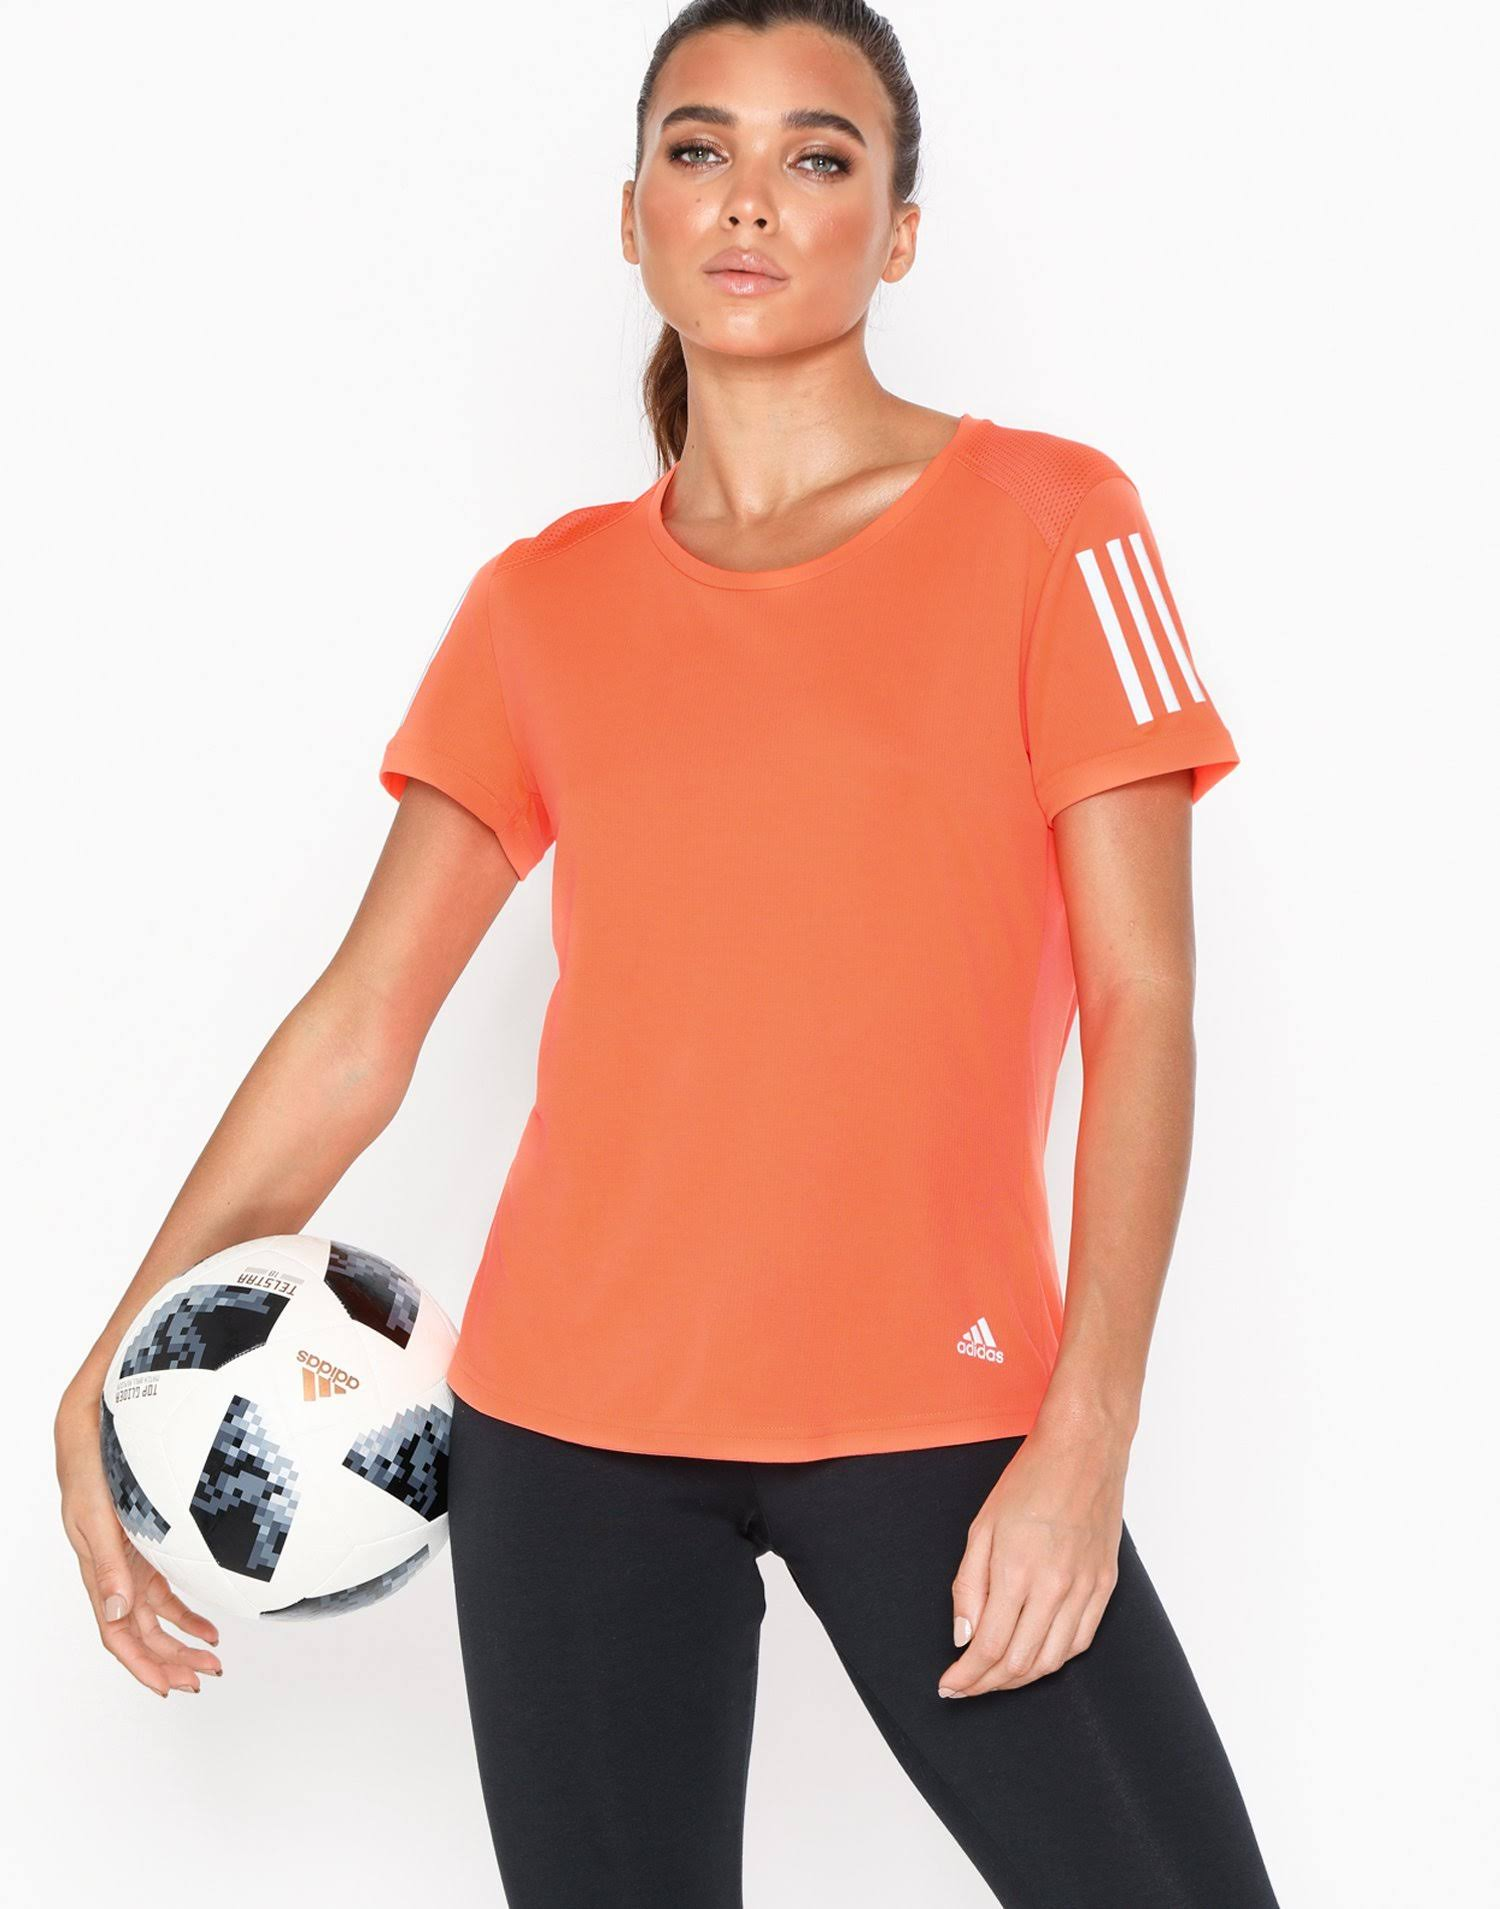 Adidas Own The Run XS